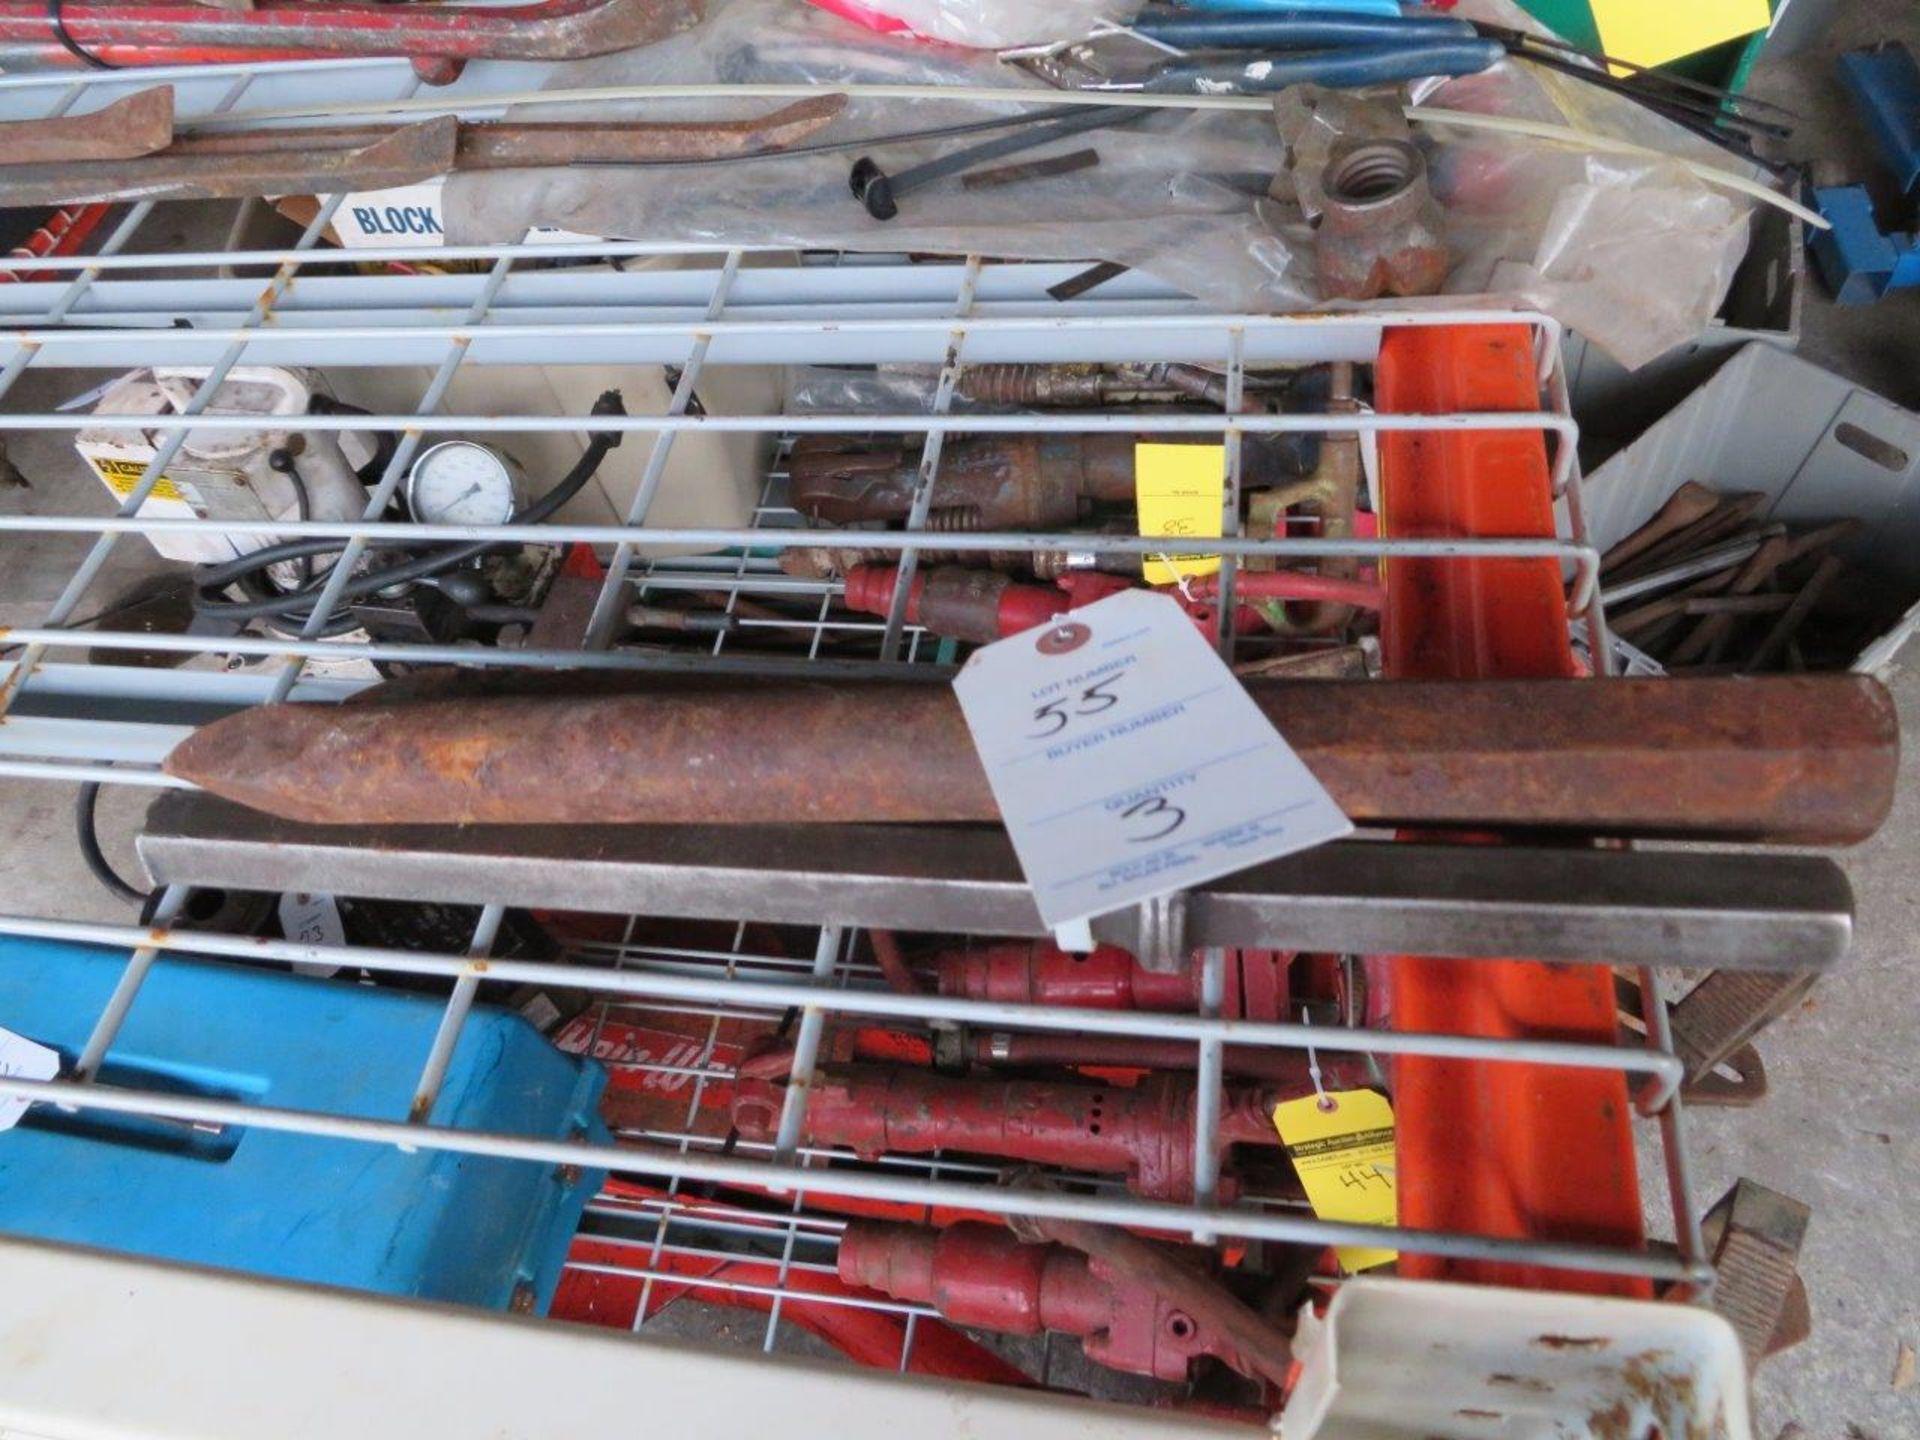 Lot 55 - (3) Large Jackhammer Bits, assorted